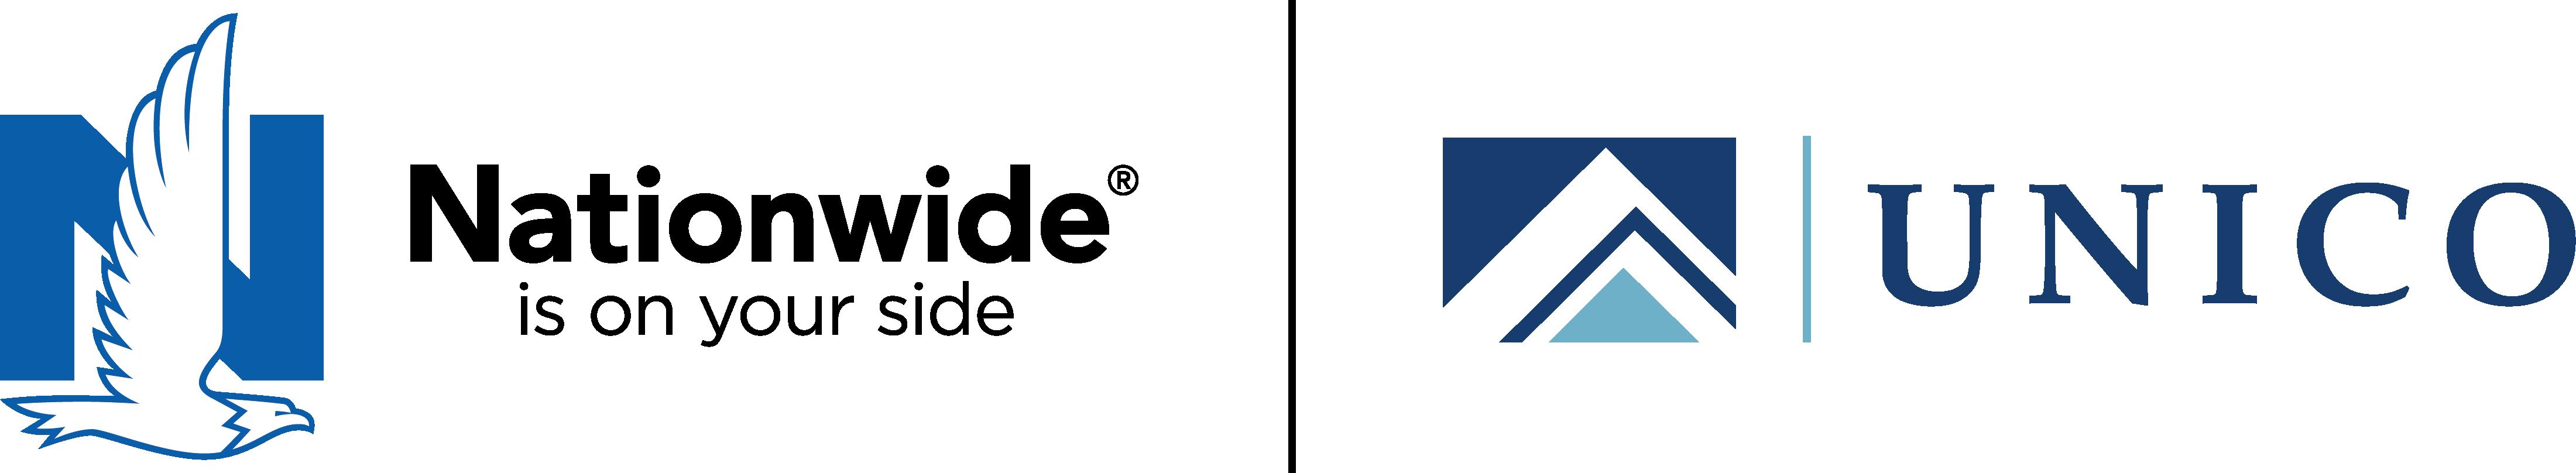 UNICO Group and Nationwide logo